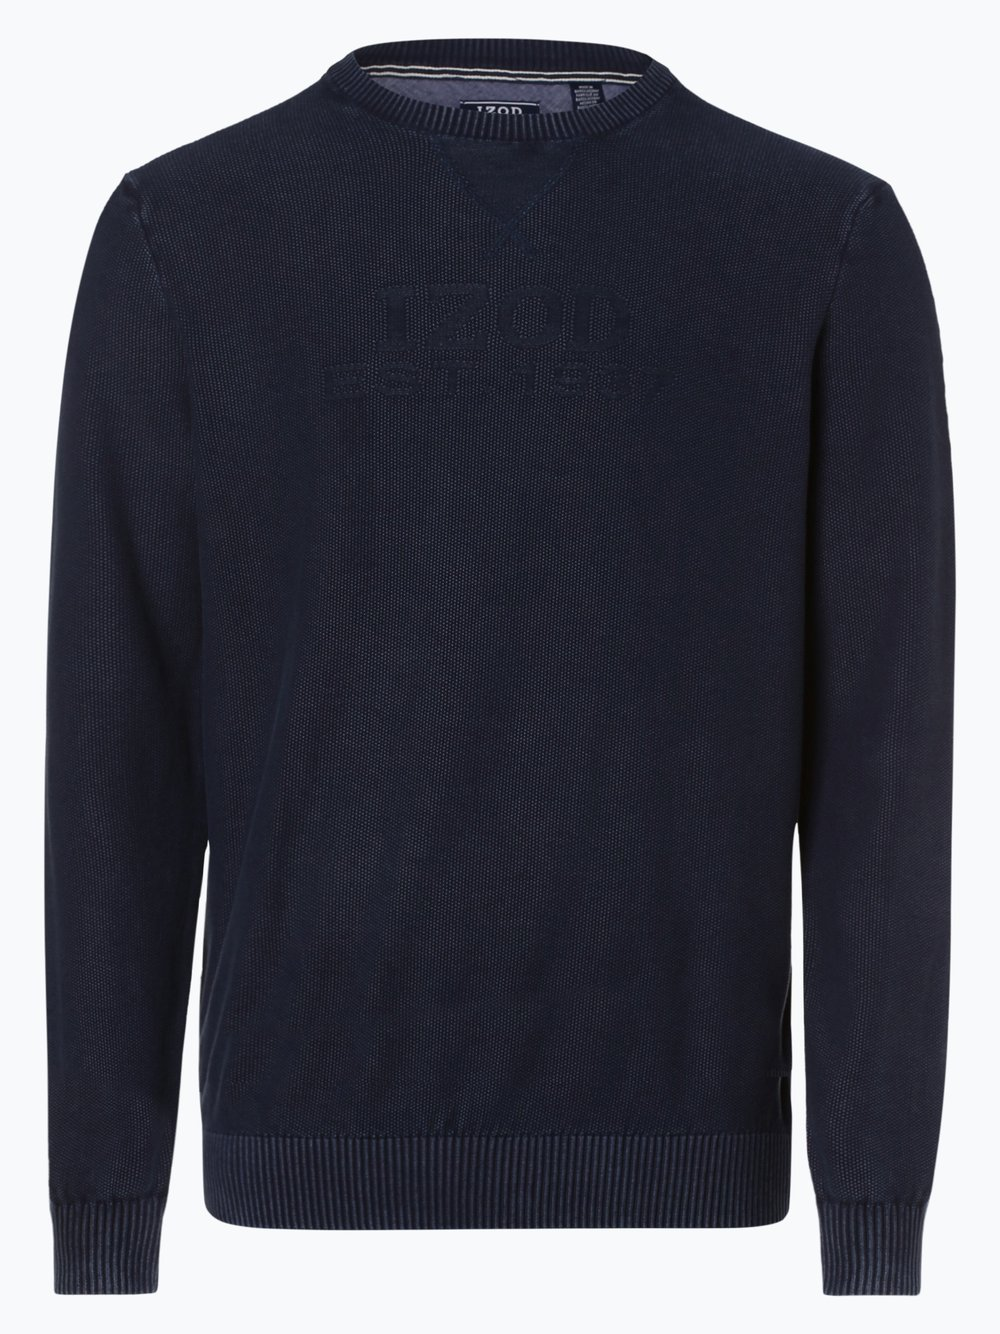 IZOD - Sweter męski, niebieski